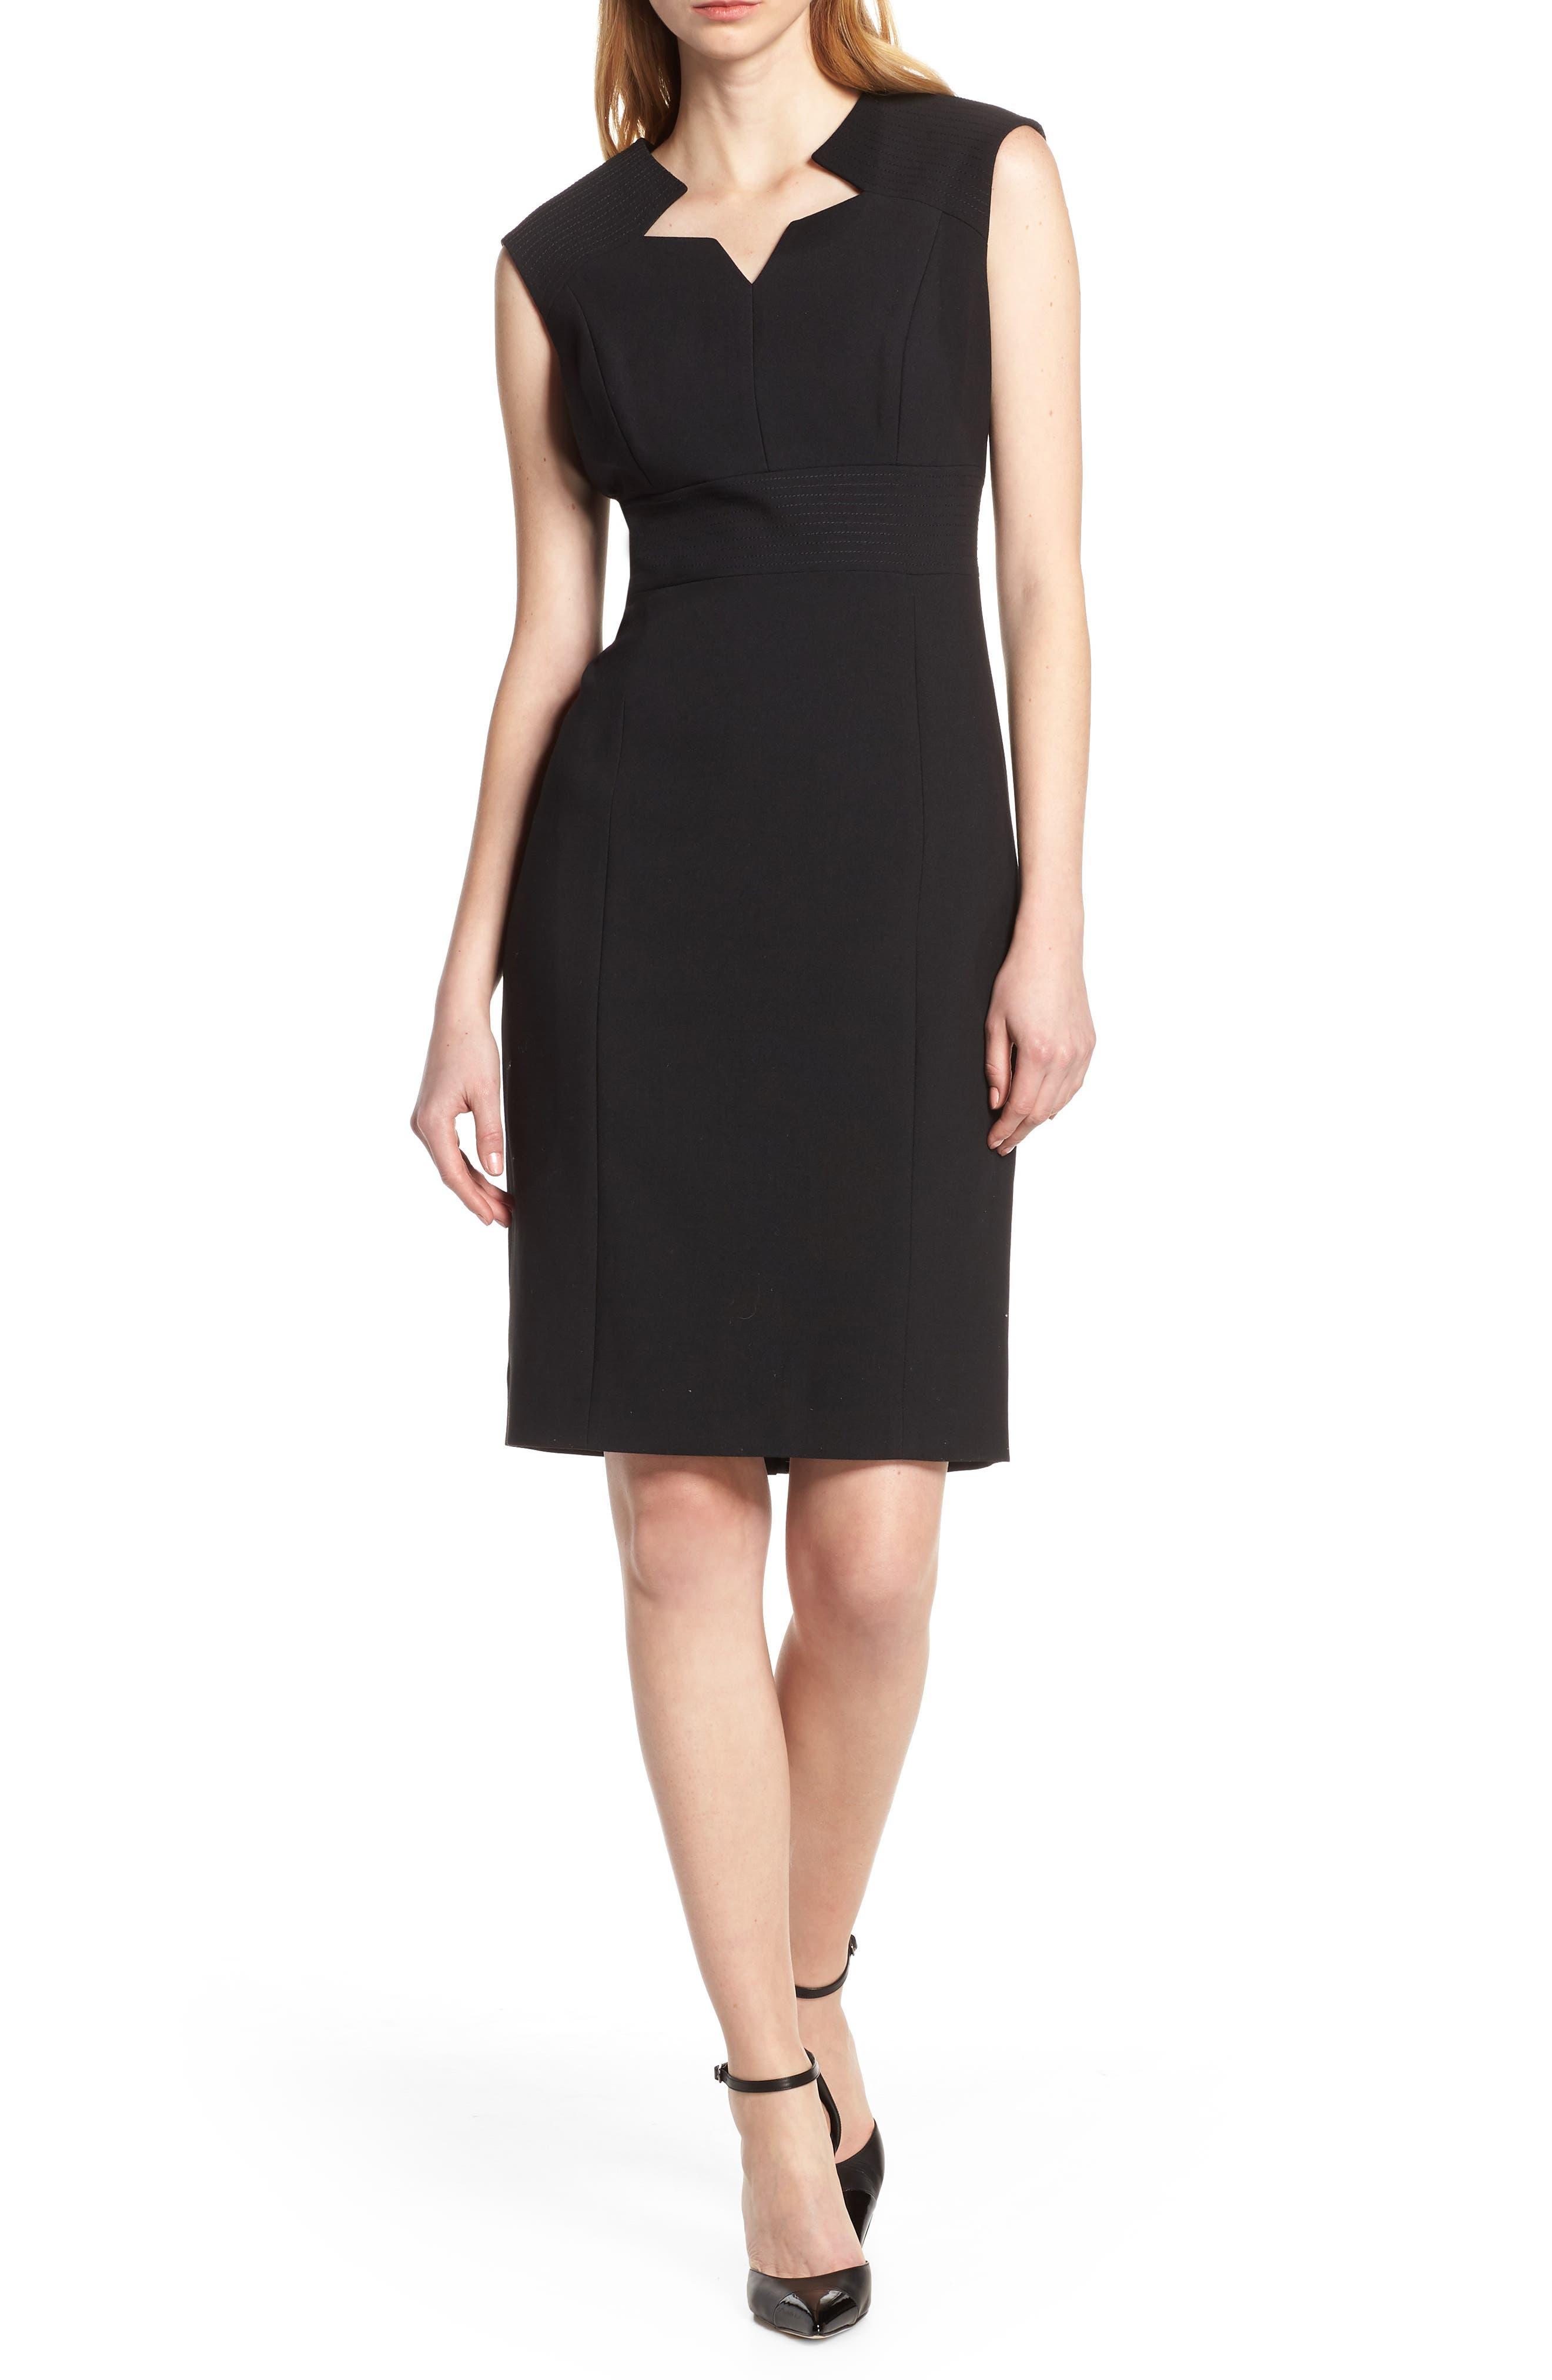 Tahari Star Neckline Crepe Sheath Dress, Black